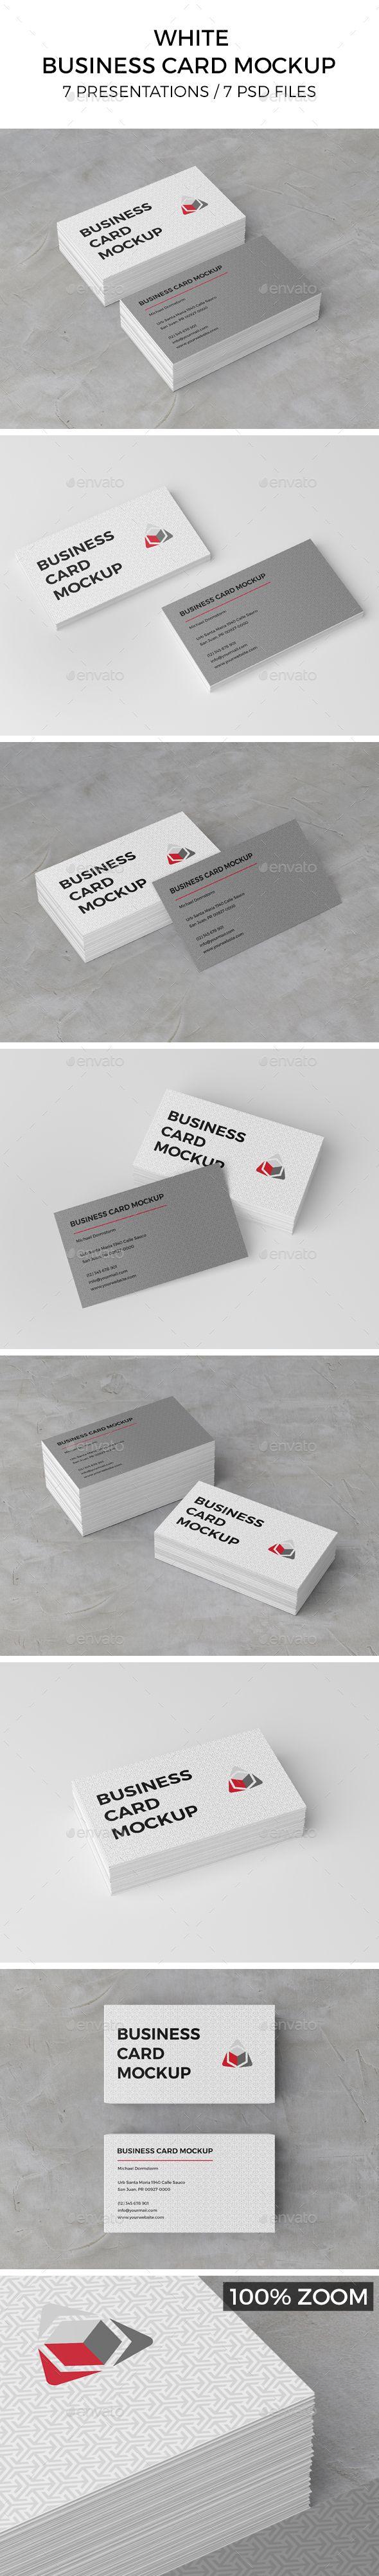 Business Card Mockup Business Card Mock Up Download Business Card Business Cards